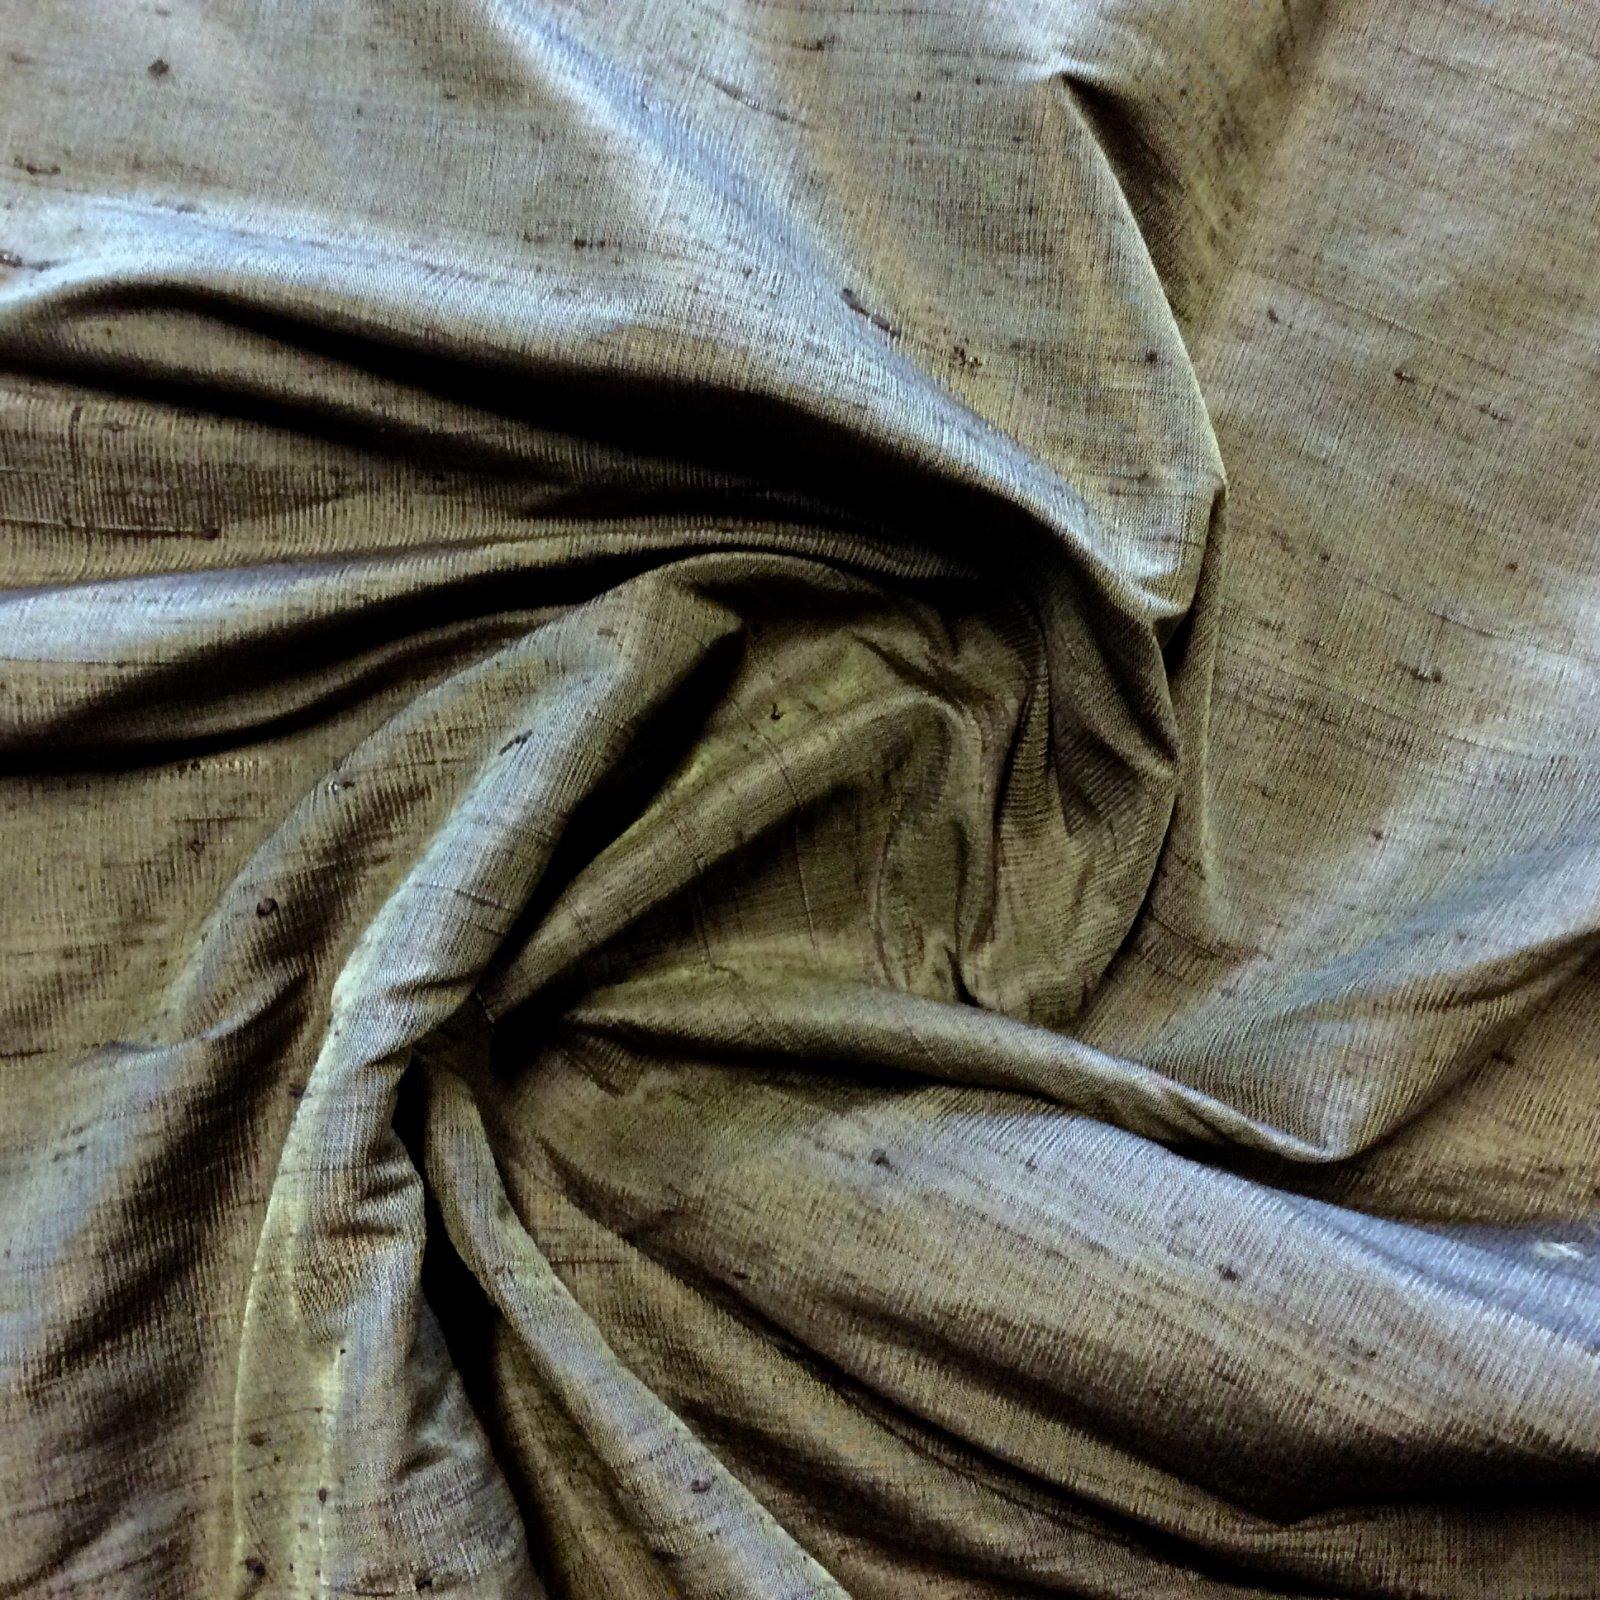 SILK Dark Brown Green Hue Exquisite Hand Woven Dupioni 100% Silk Fabric Drapery By the Yard SH27